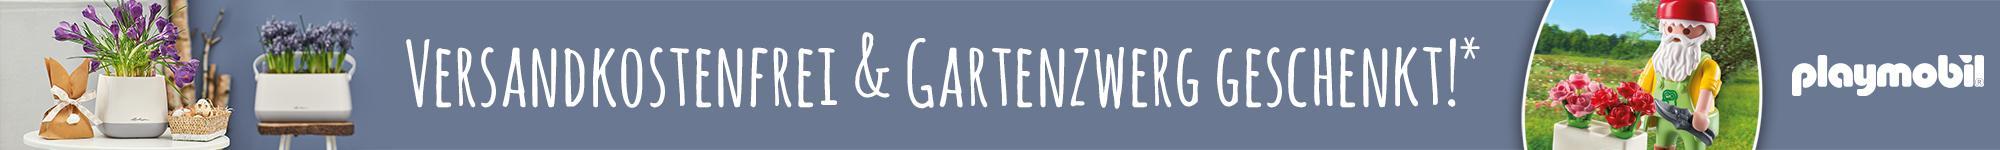 le_listing_banner_gartenzwerg_2019_de